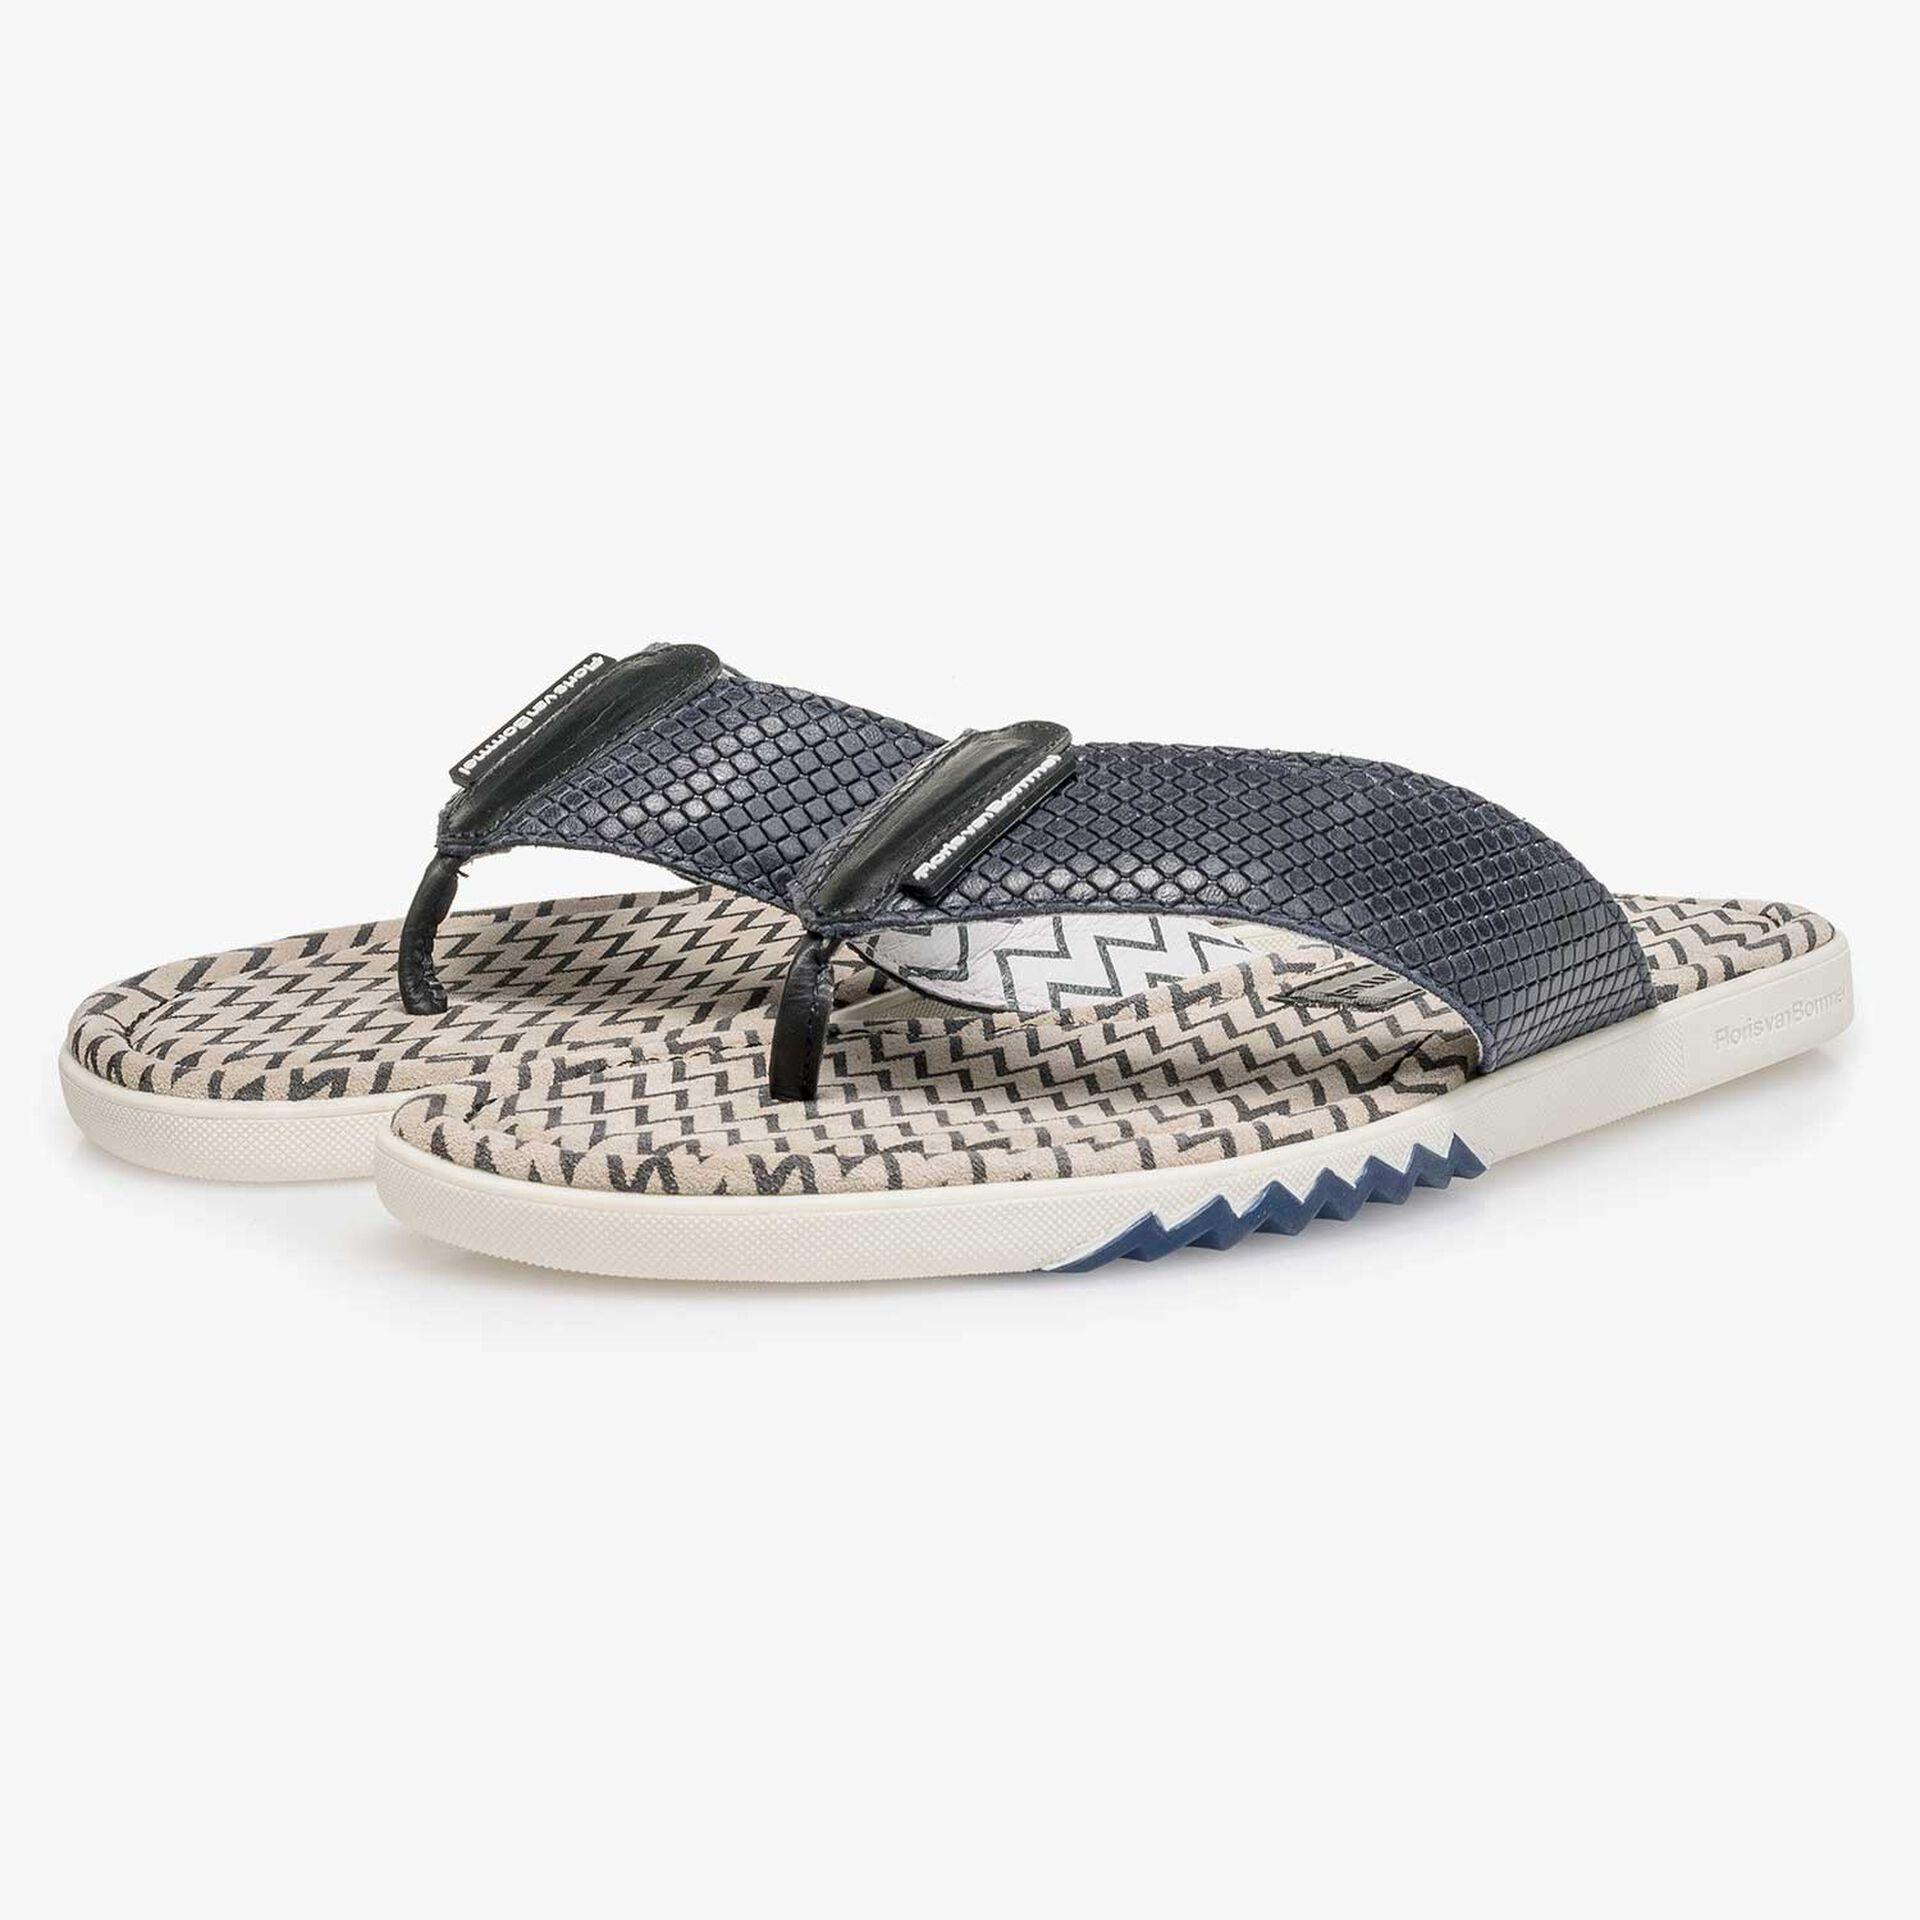 Blue printed calf leather thong slipper